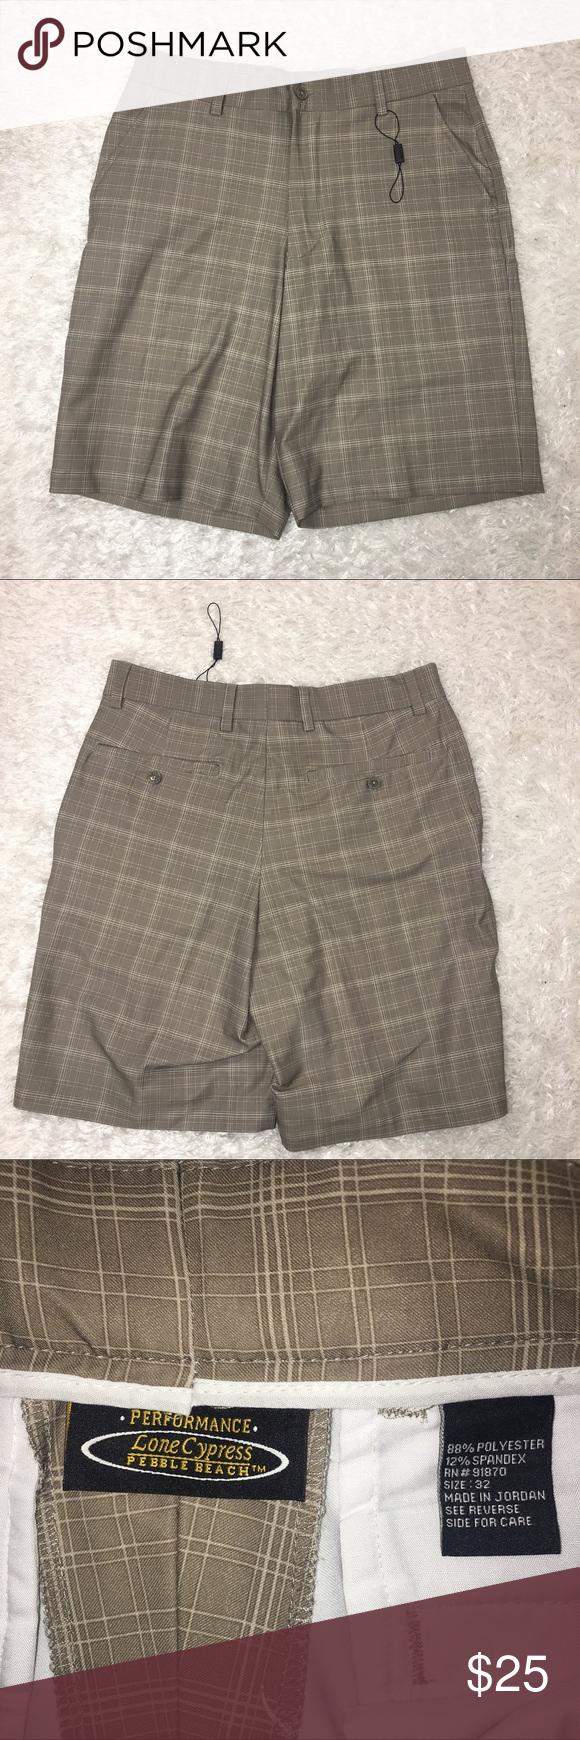 abbf02b1f2 Lone Cupress Golf Shorts | Size 10, Shorts and Ships